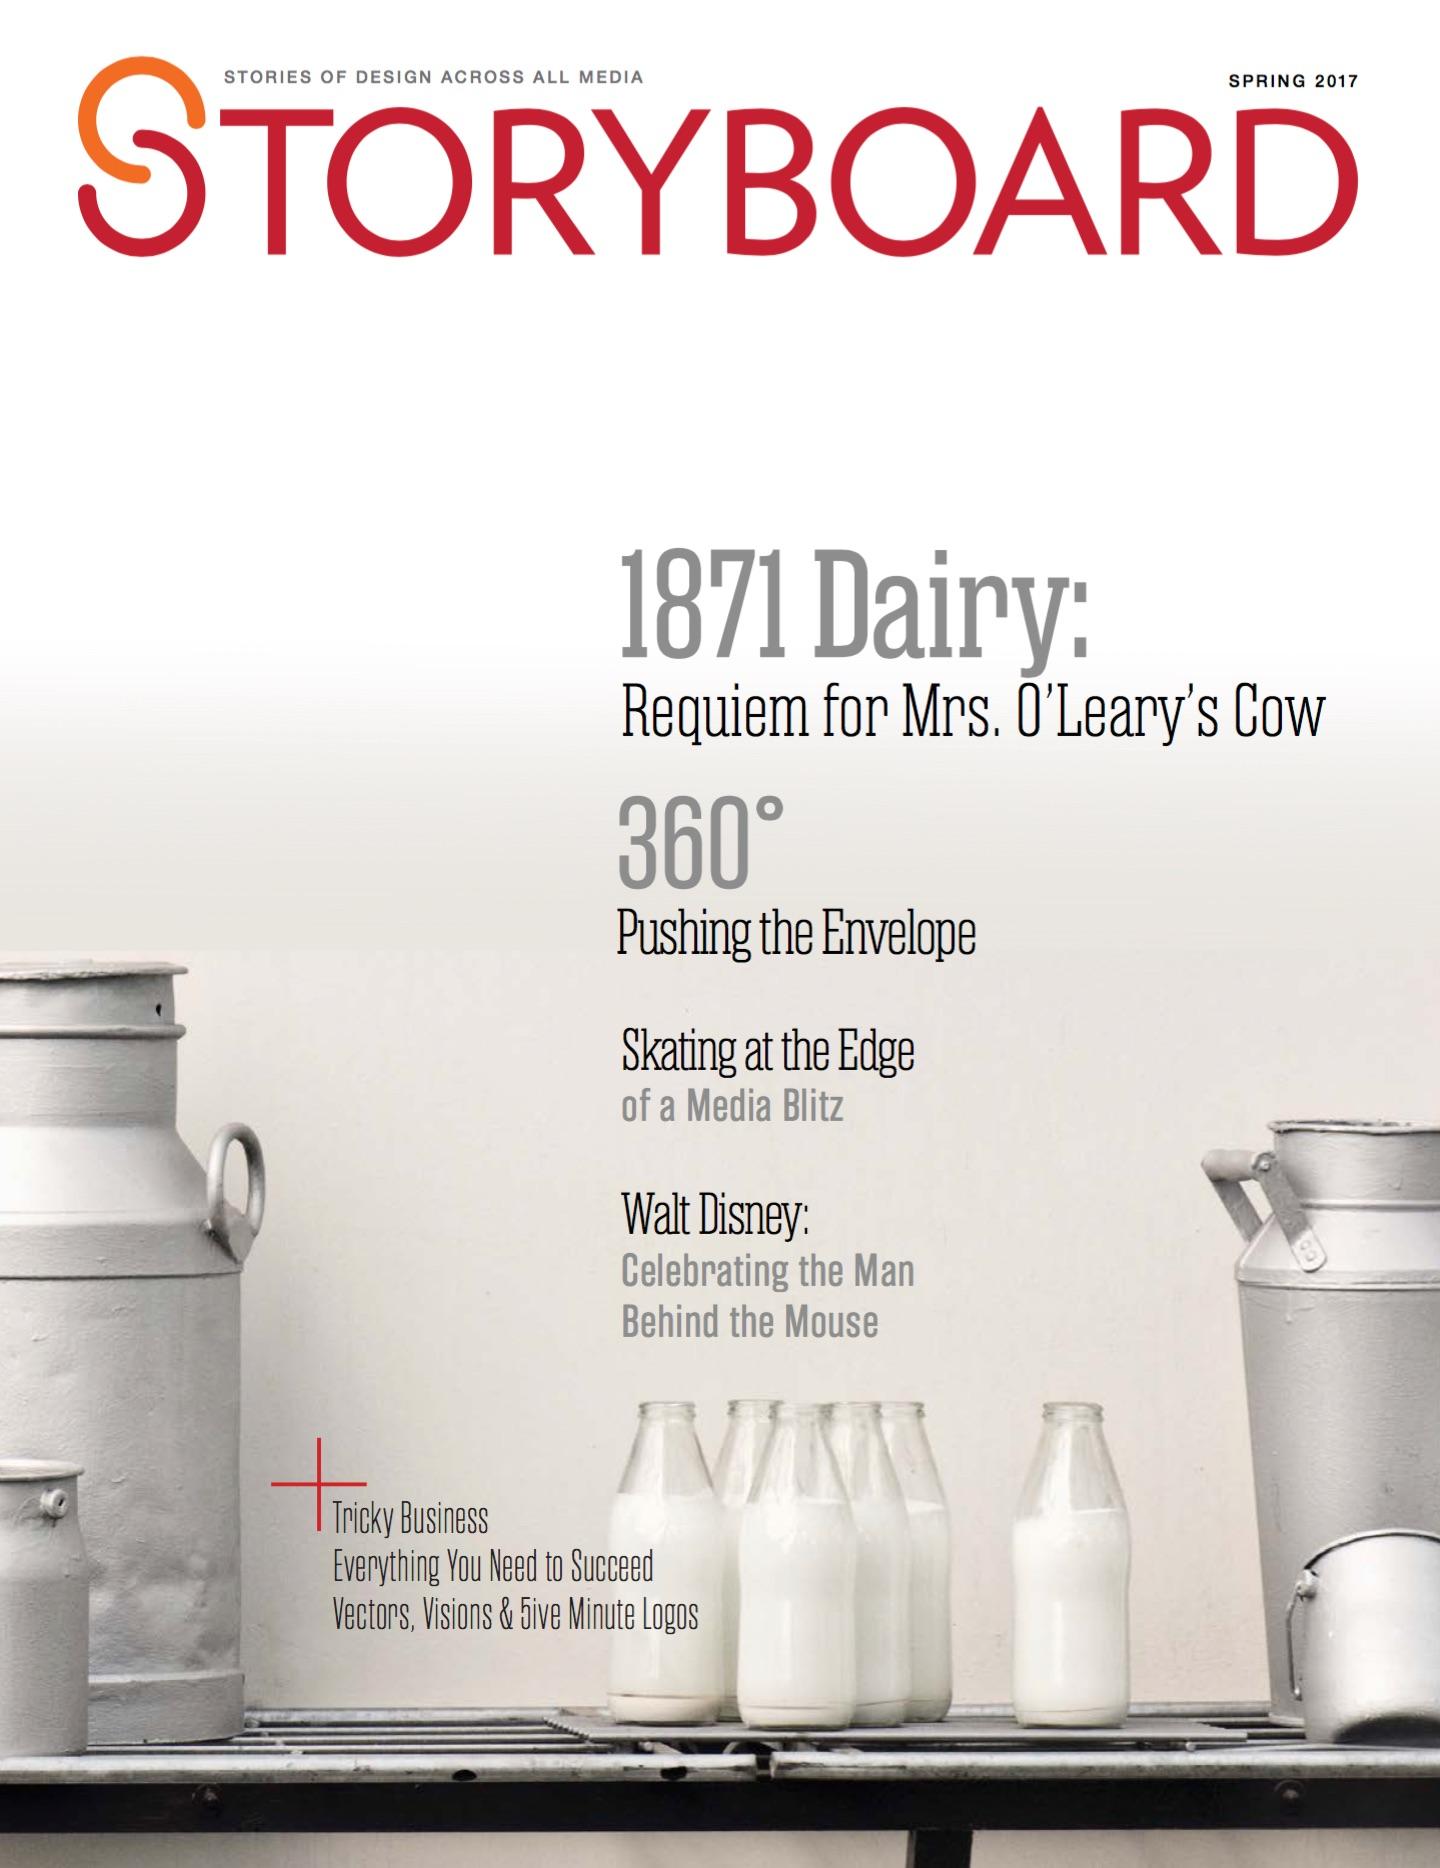 Storyboard magazine